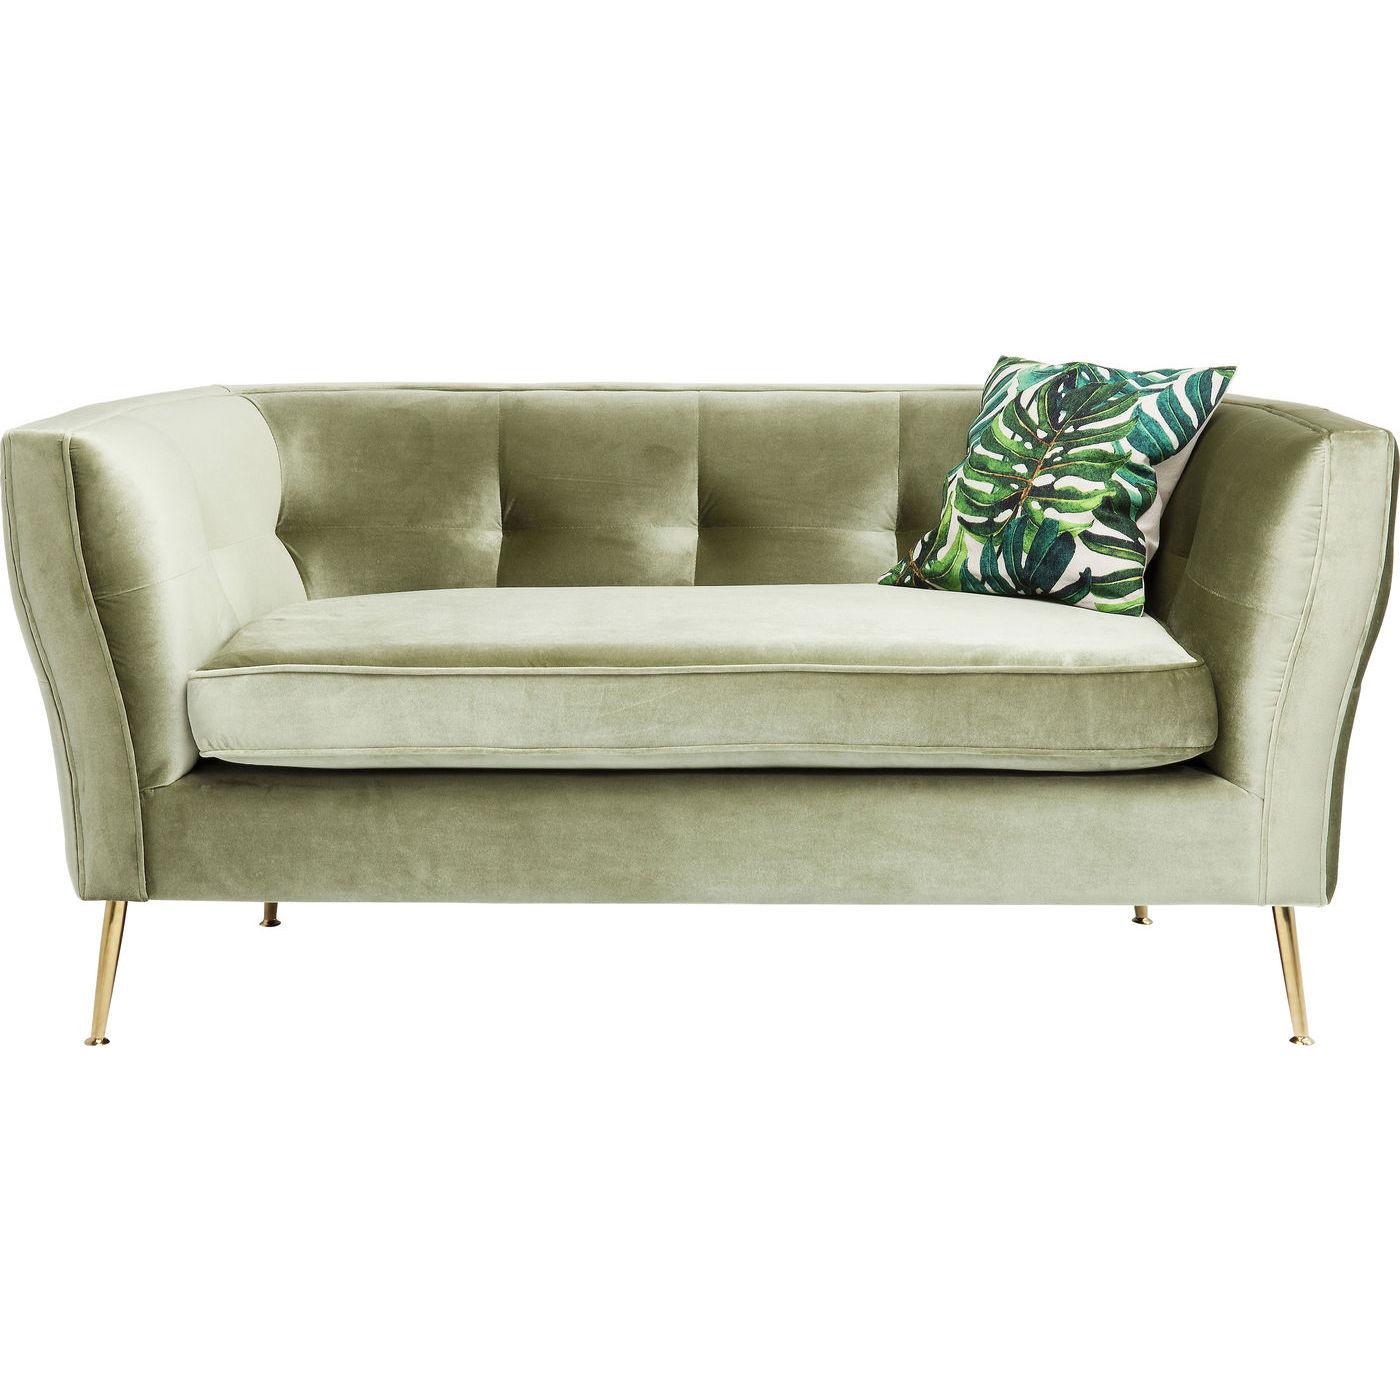 Sofa Rimini Green 2 Sitzer 160cm KARE Design